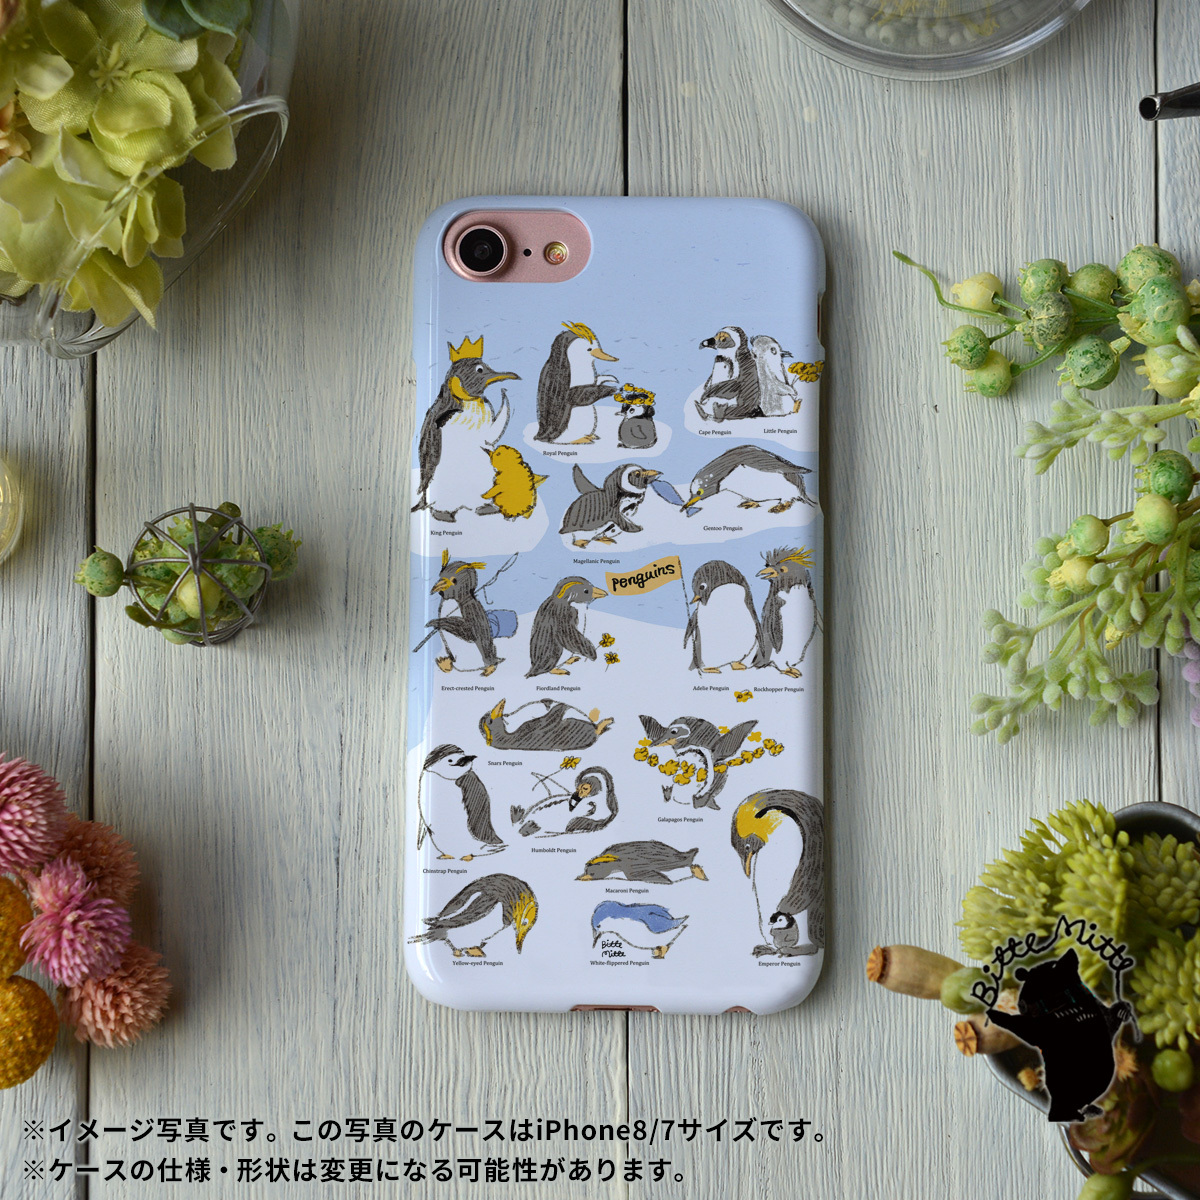 iphone8 ハードケース おしゃれ iphone8 ハードケース シンプル iphone7 ケース かわいい 夏 鳥 花 ペンギンの島/Bitte Mitte!